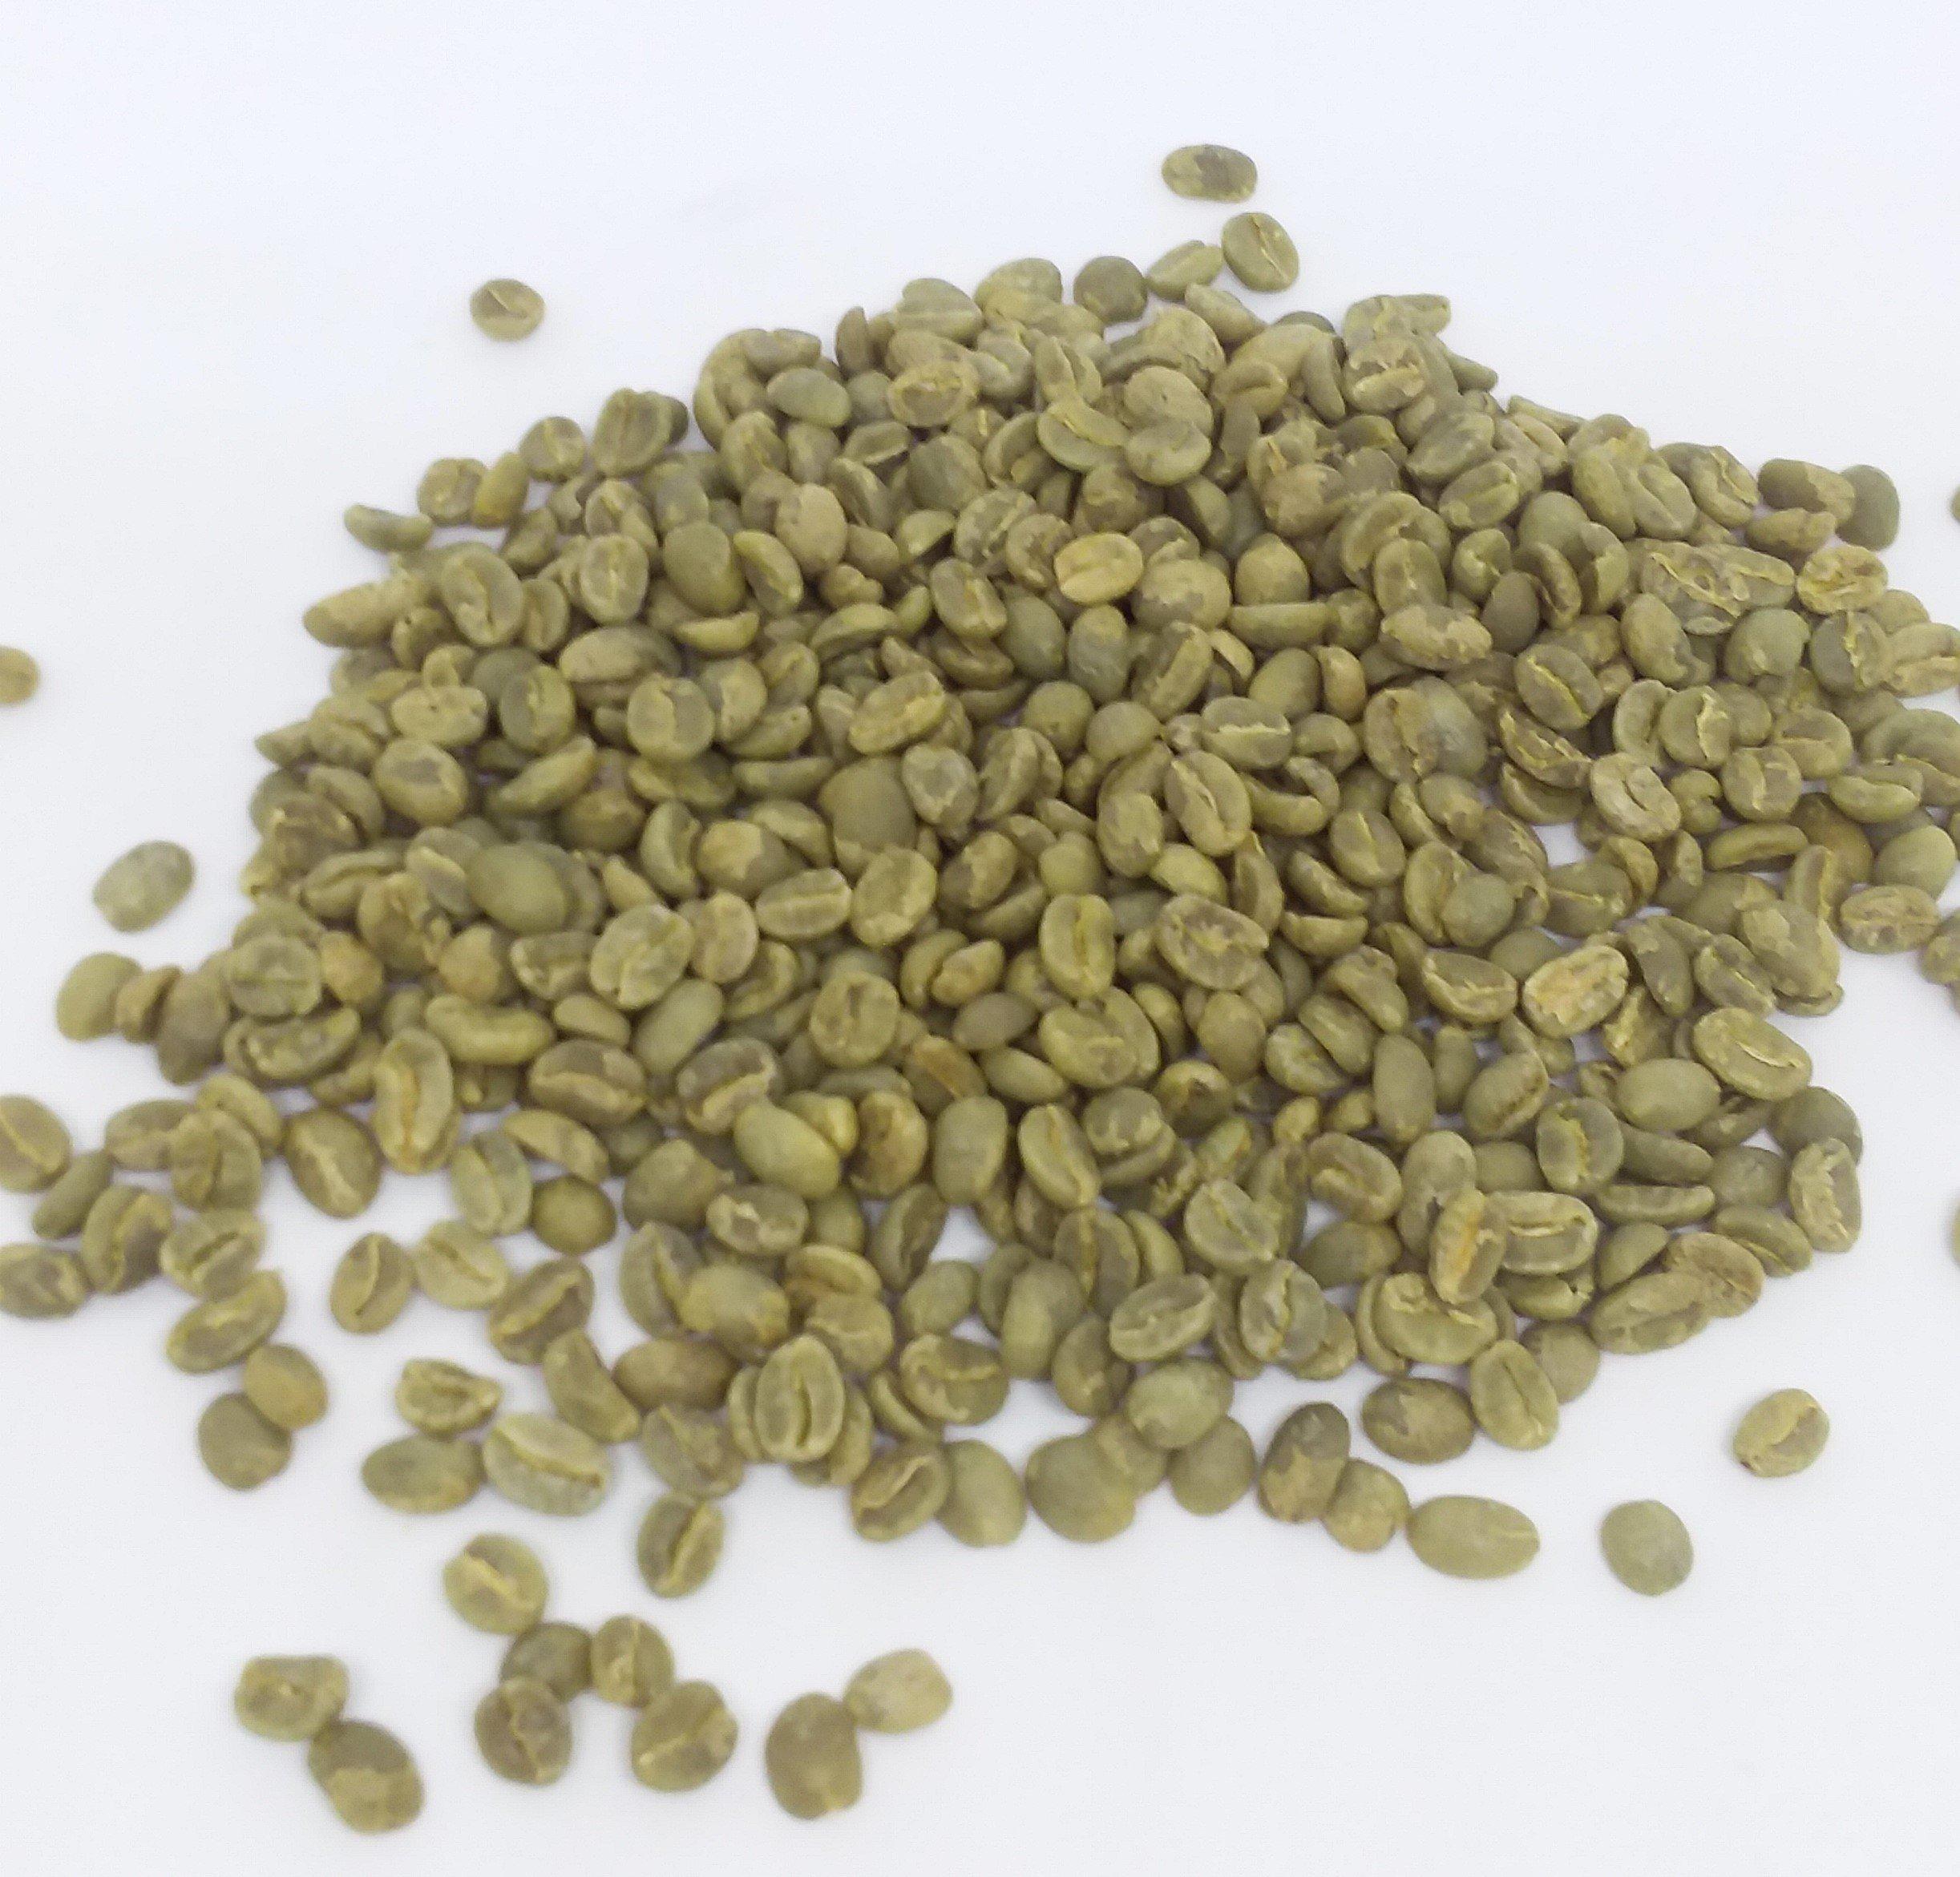 Colombian Green Coffee,Unroasted Coffee Beans Single Origin Farm El Nivel (10 Lb) by Lot # 017-104